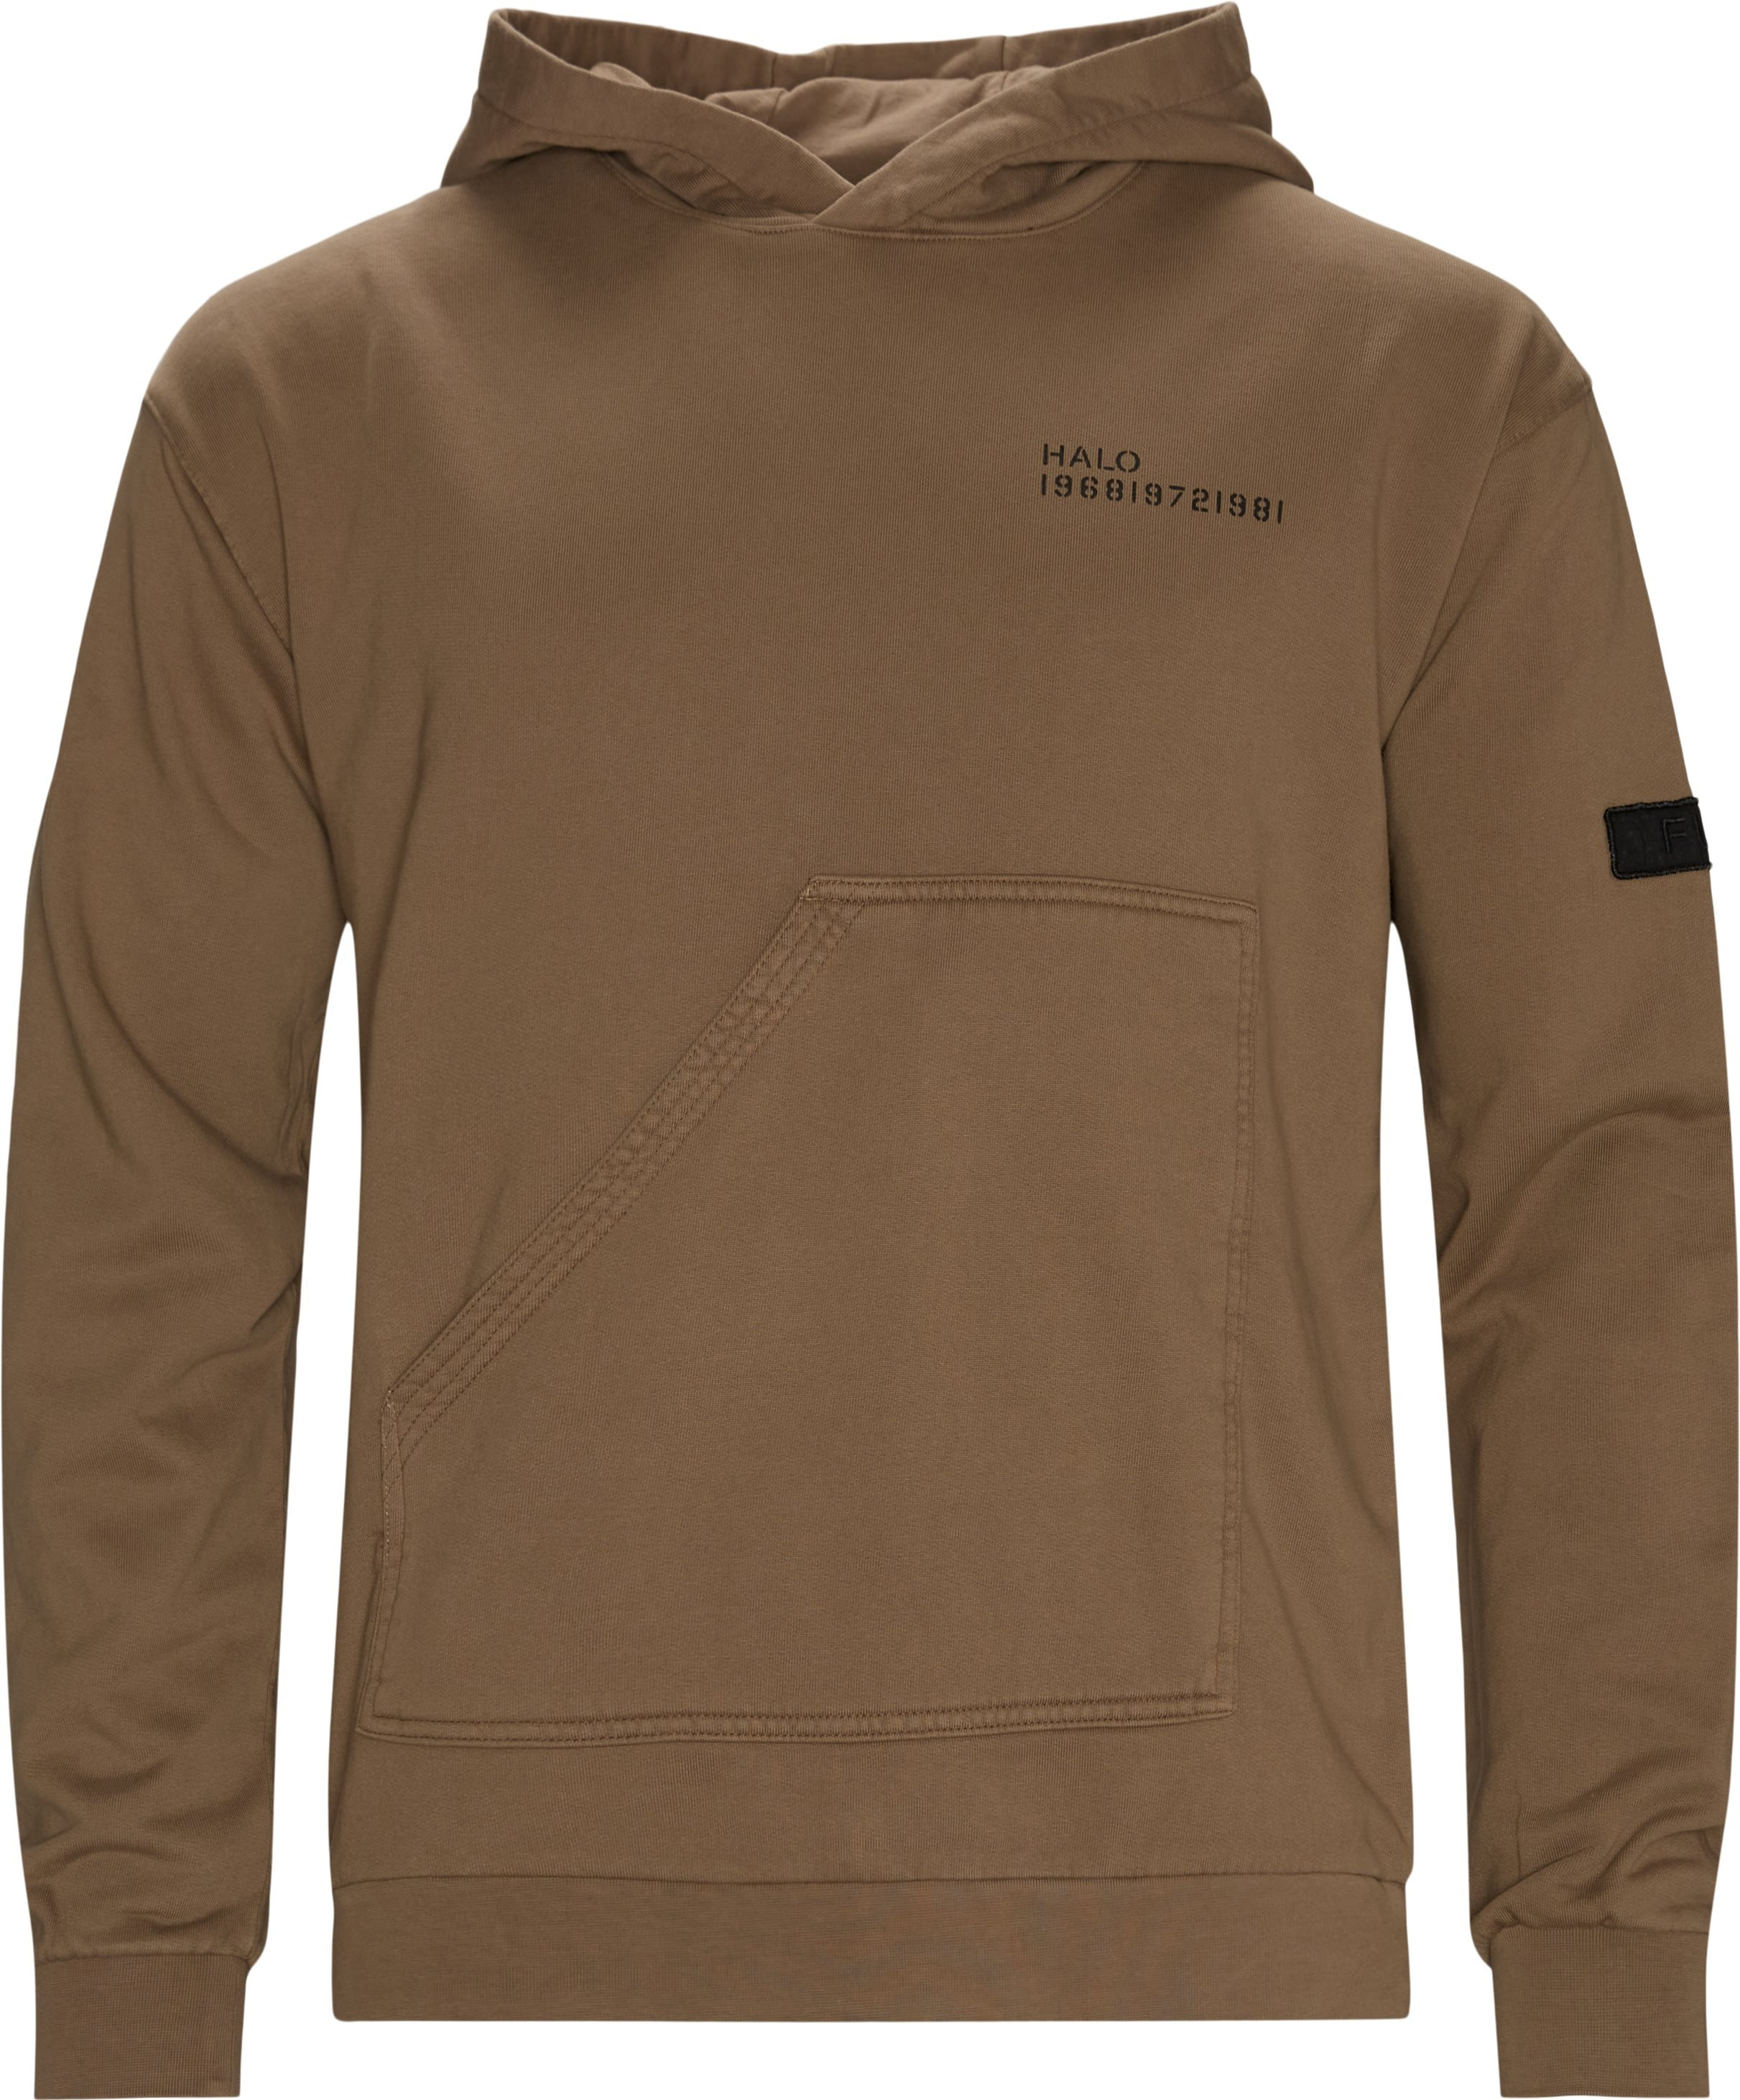 Cotton Hoodie - Sweatshirts - Regular fit - Sand